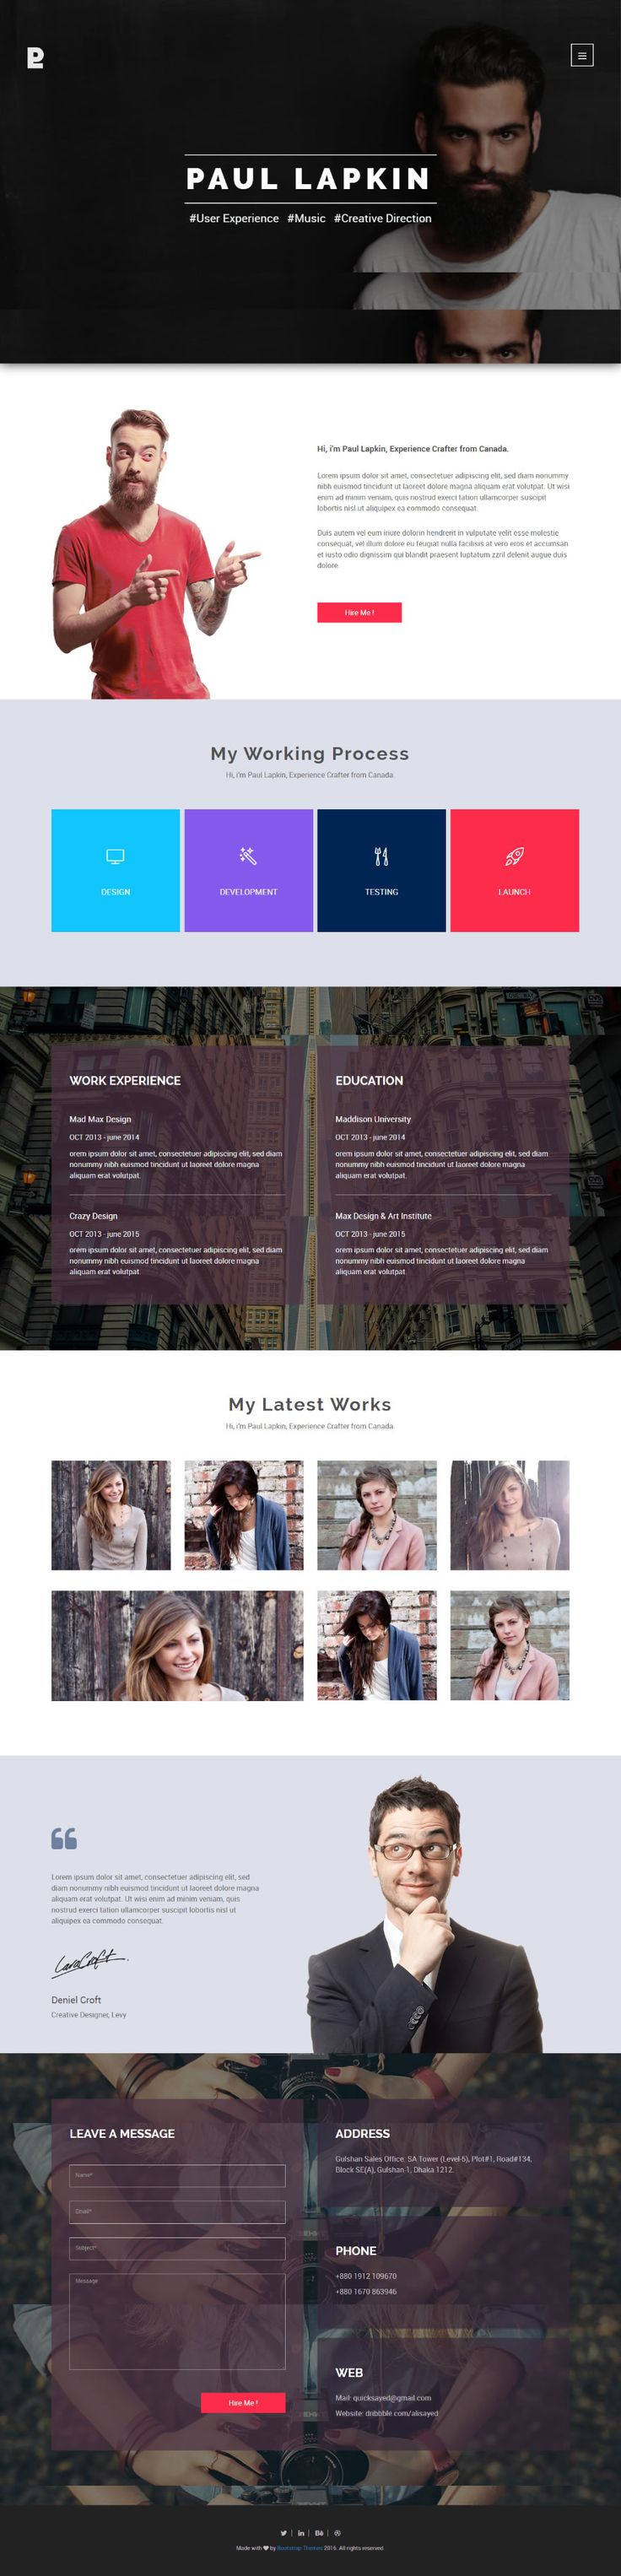 Best 25+ Free html templates ideas on Pinterest | Finger puppets ...